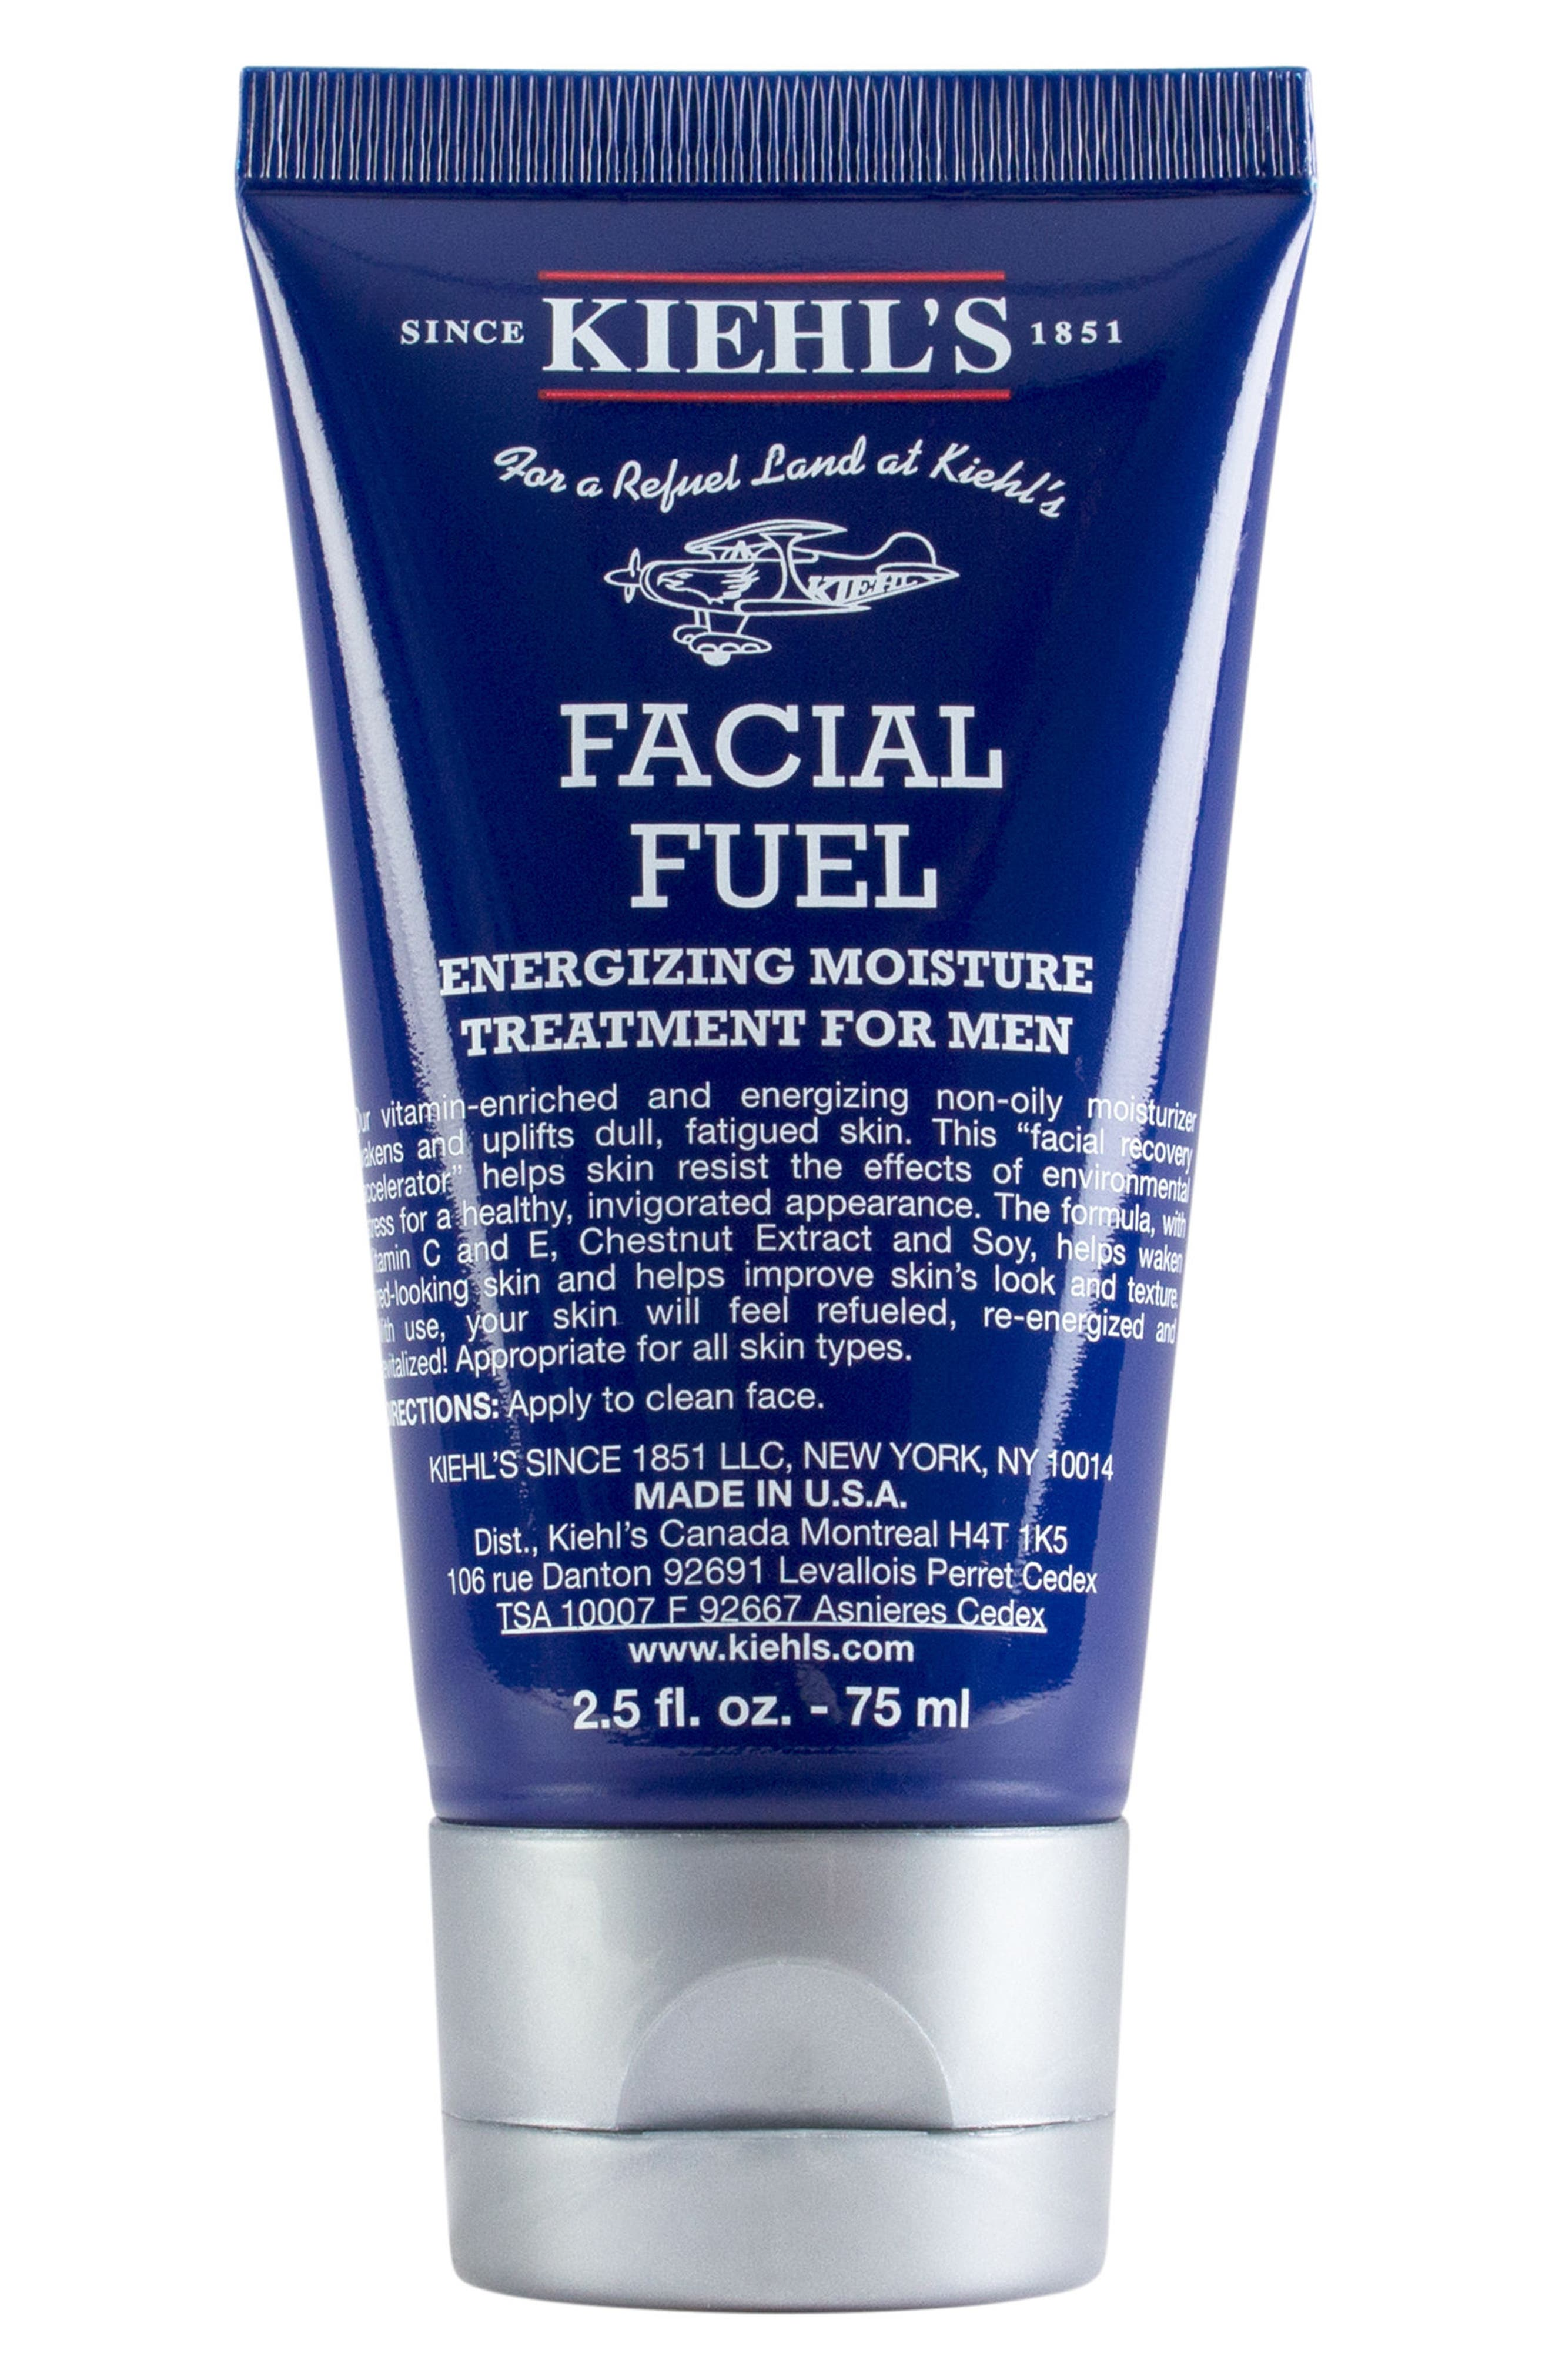 Facial Fuel Energizing Moisture Treatment for Men | Nordstrom